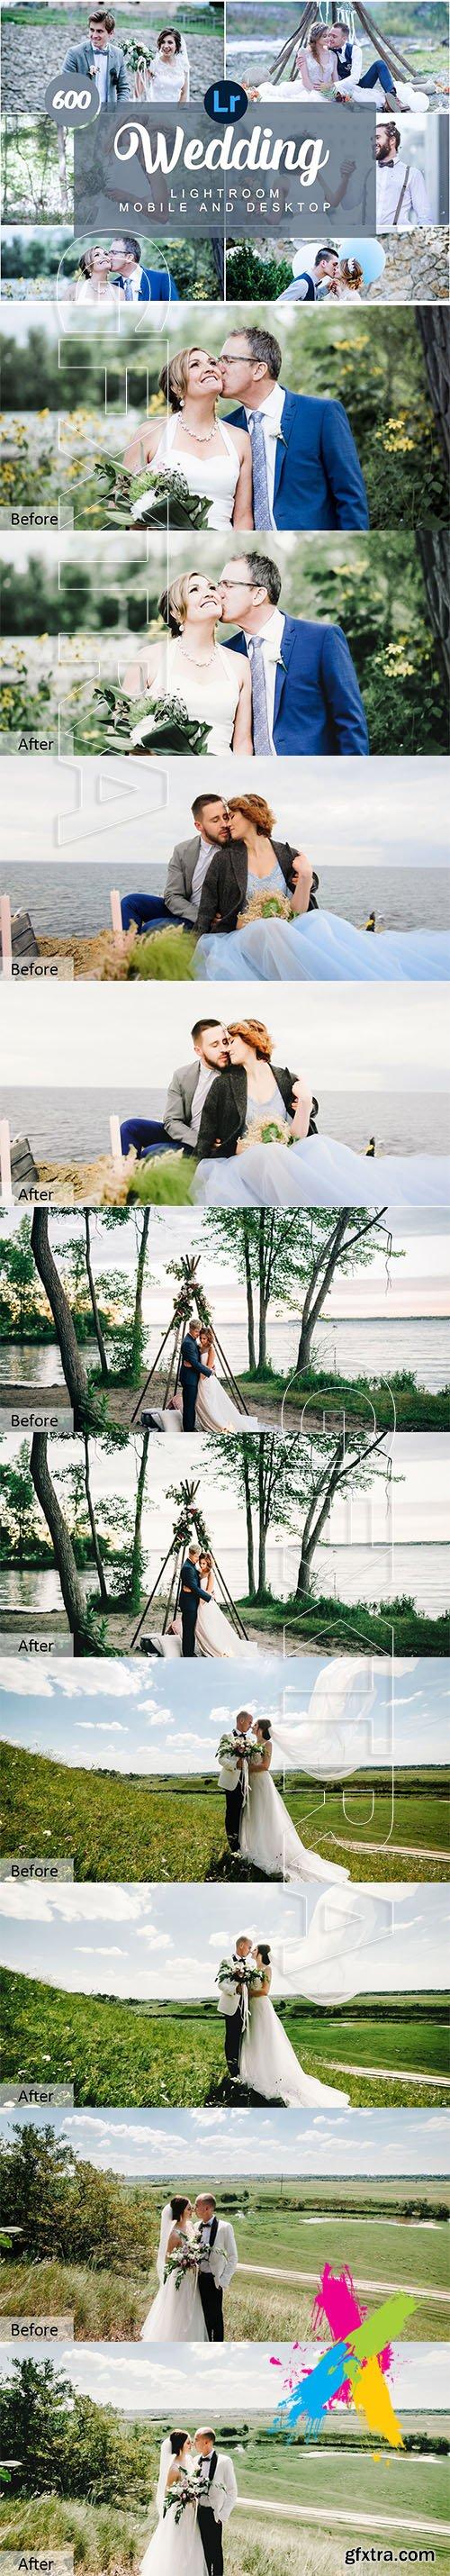 CreativeMarket - Wedding Mobile and Desktop PRESETS 5736478